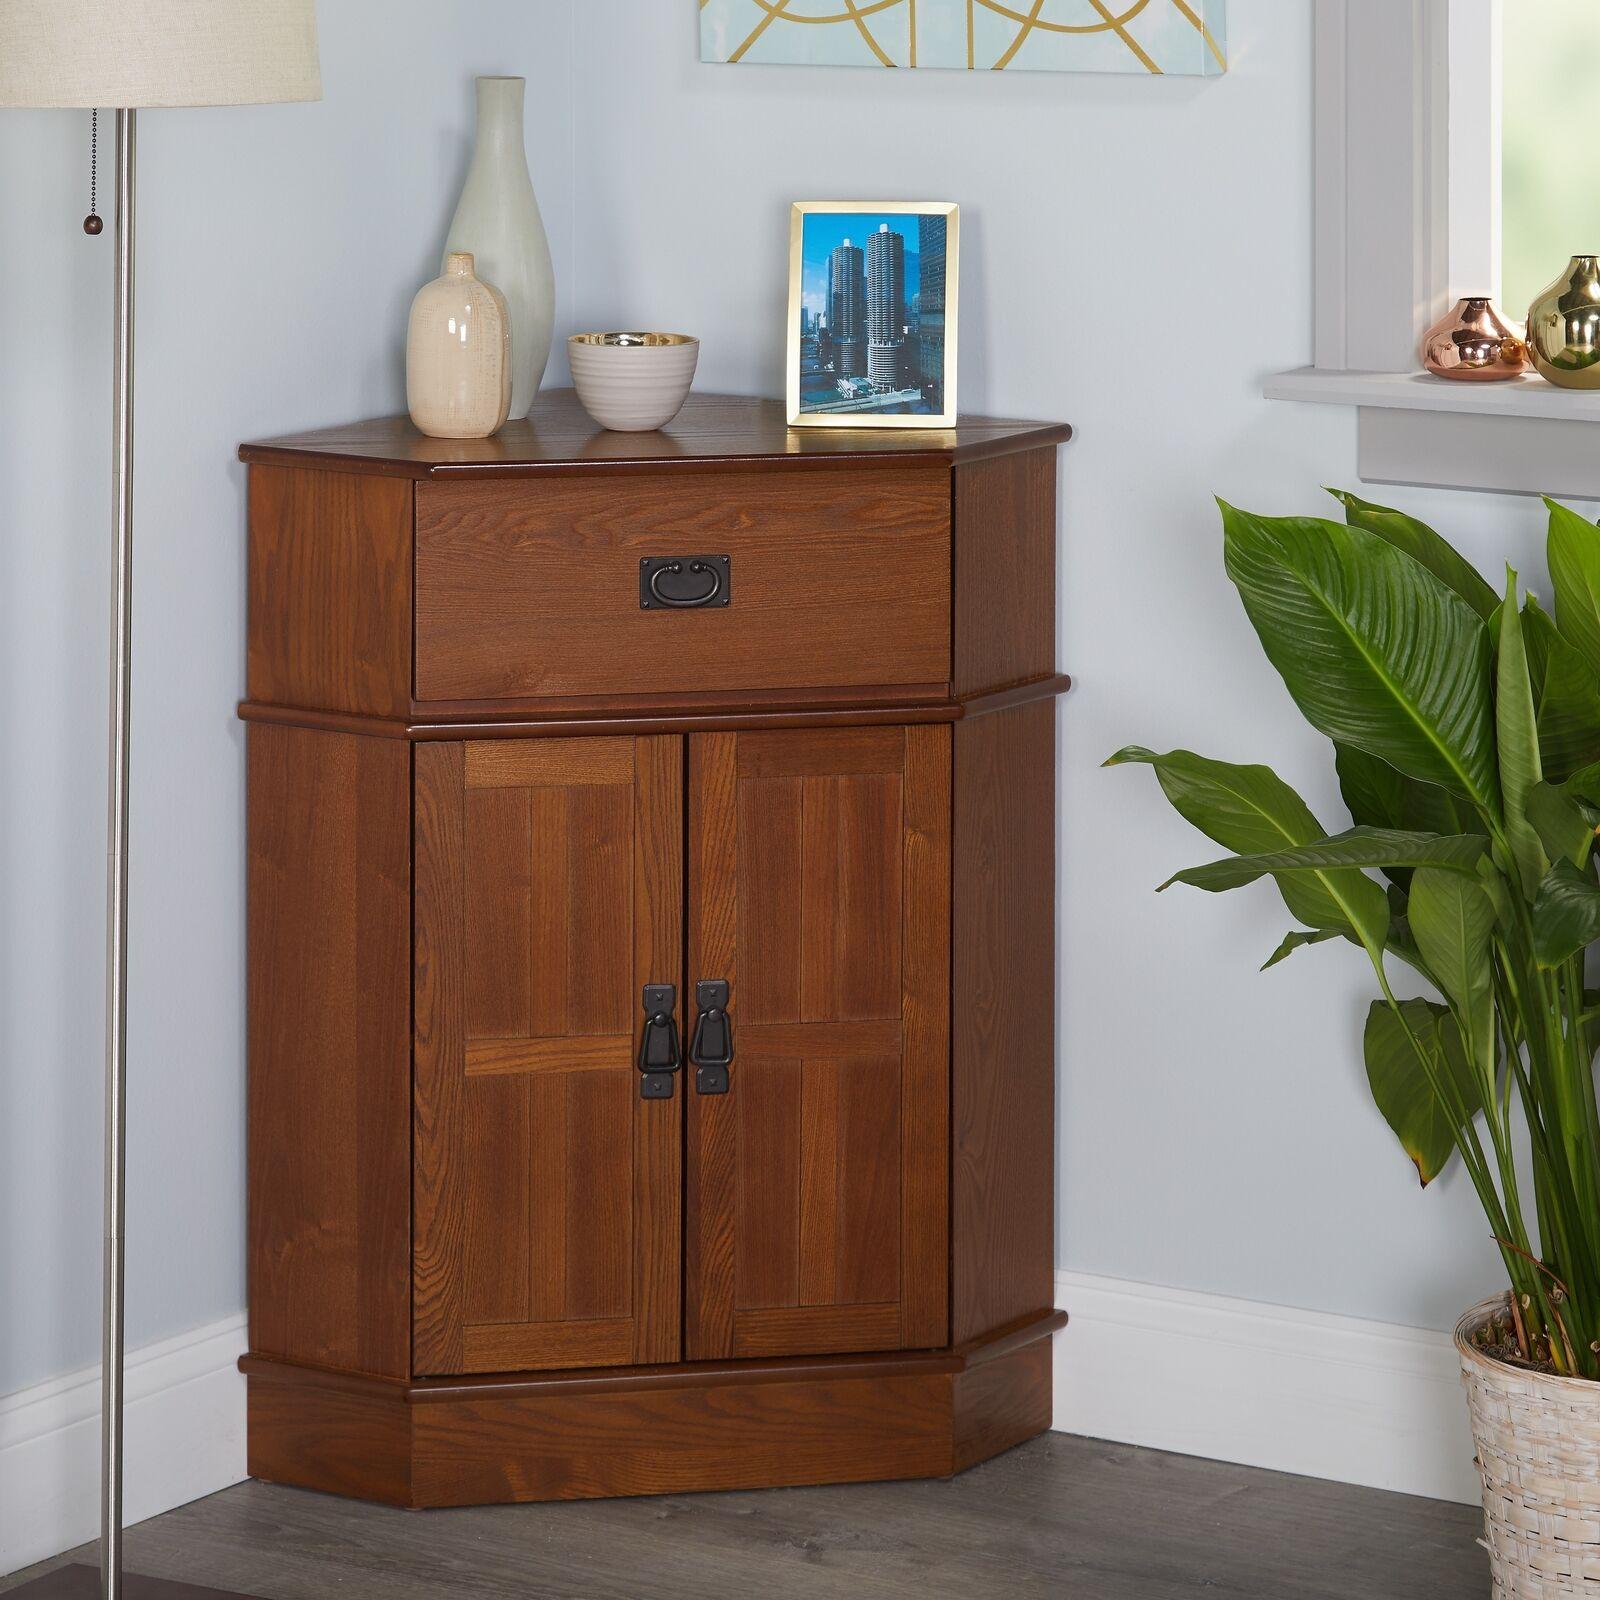 Corner Cabinet With Doors Floor Storage Mission Style Organizer